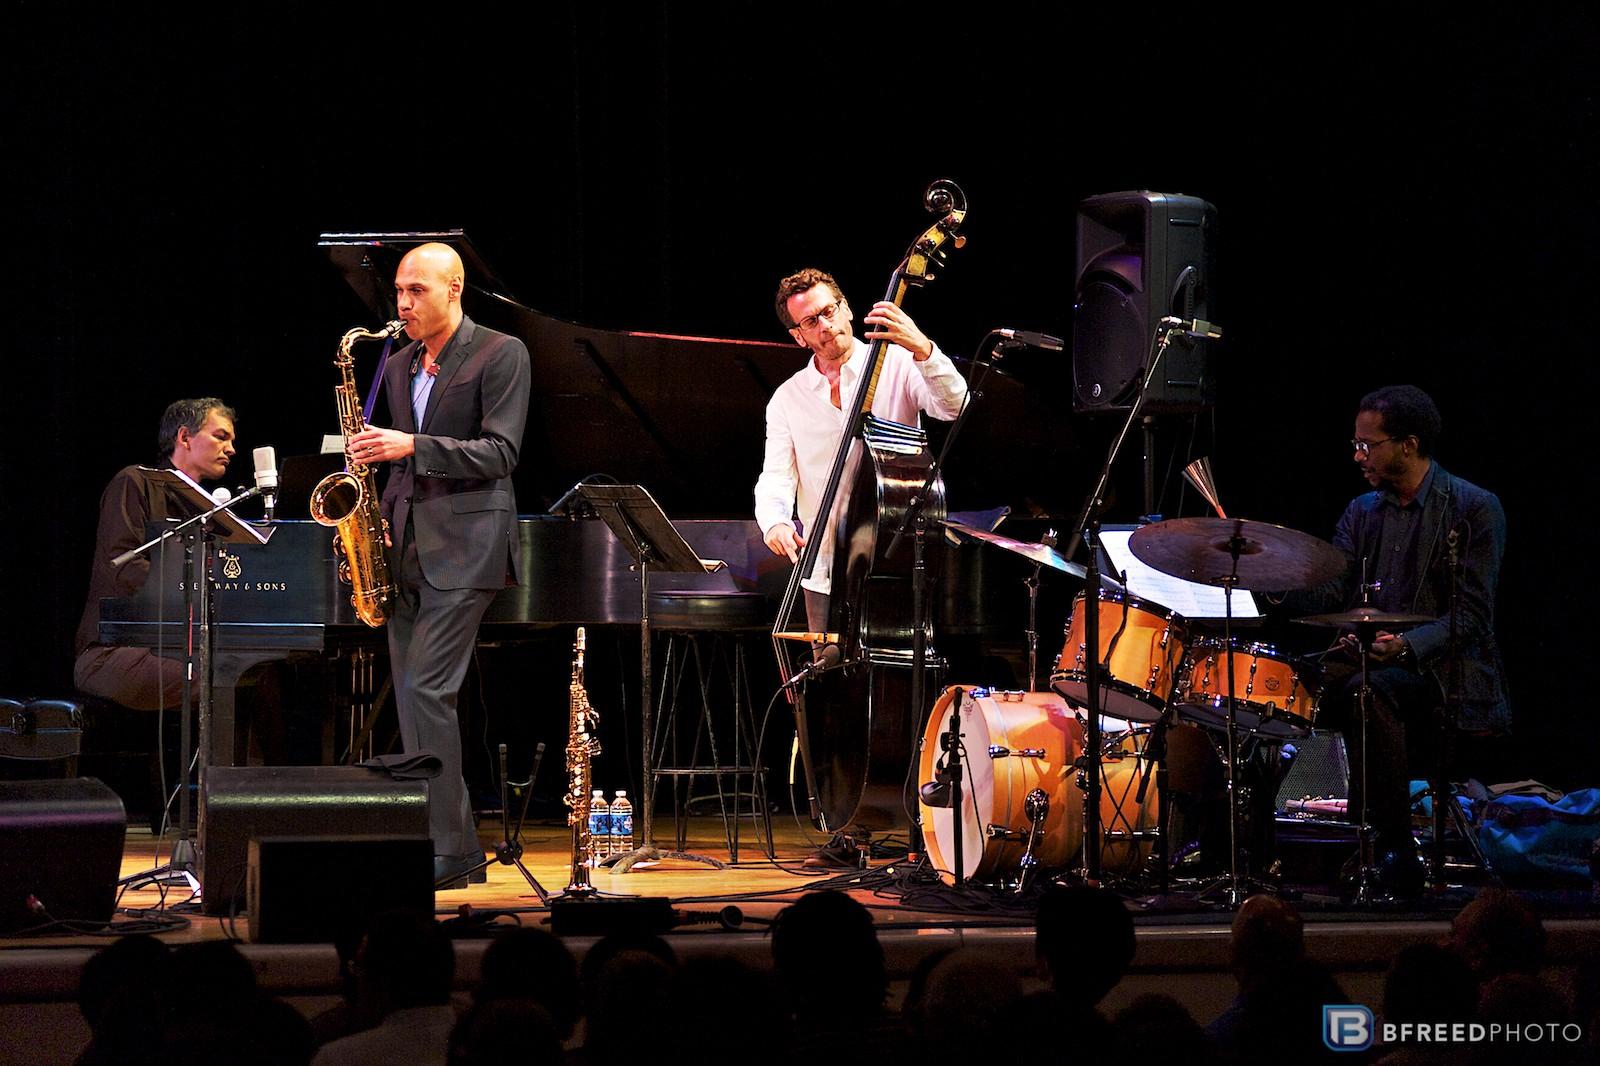 Blue Note Jazz Festival 2013